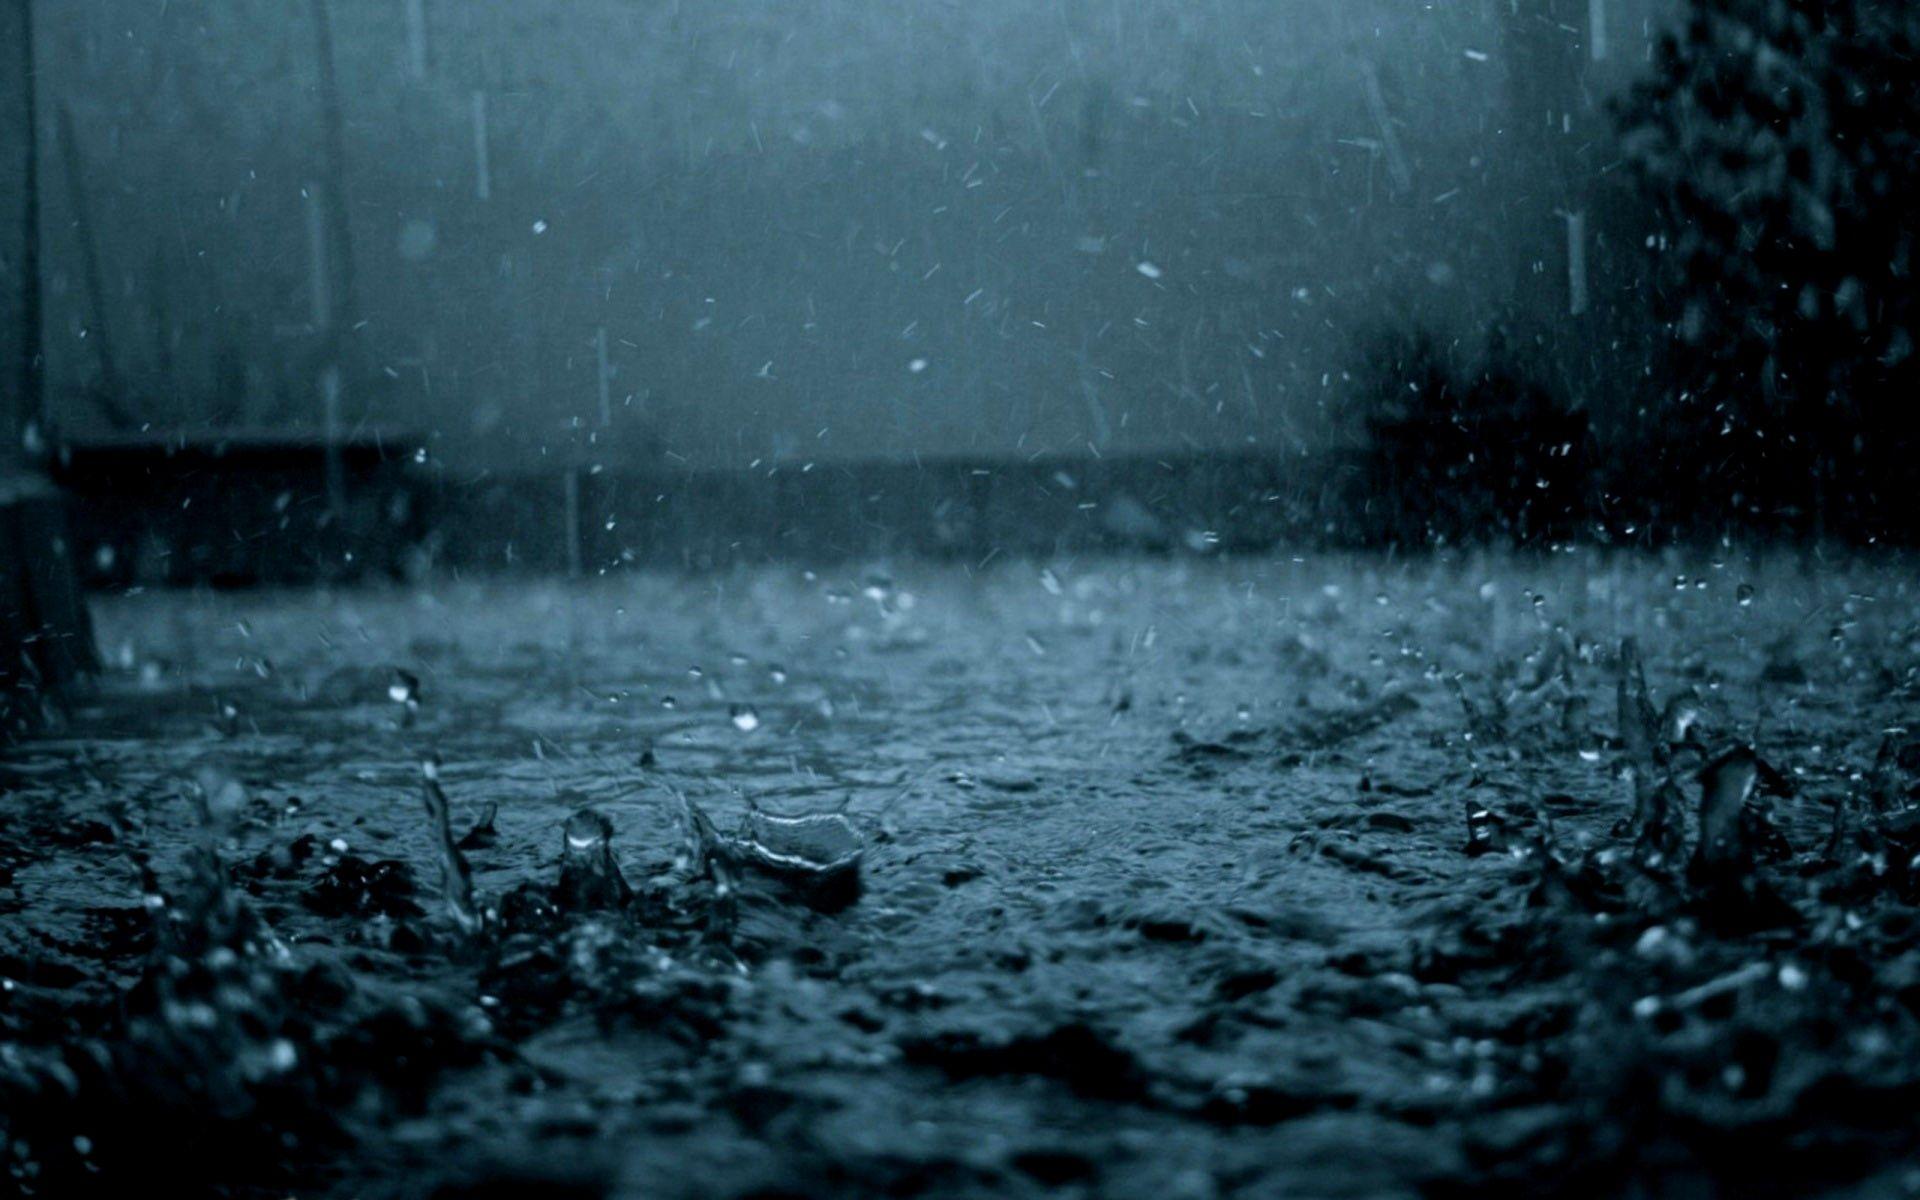 Rain Wallpaper 4k For Pc Ideas Rain Wallpapers Rain Water Collection Dancing In The Rain